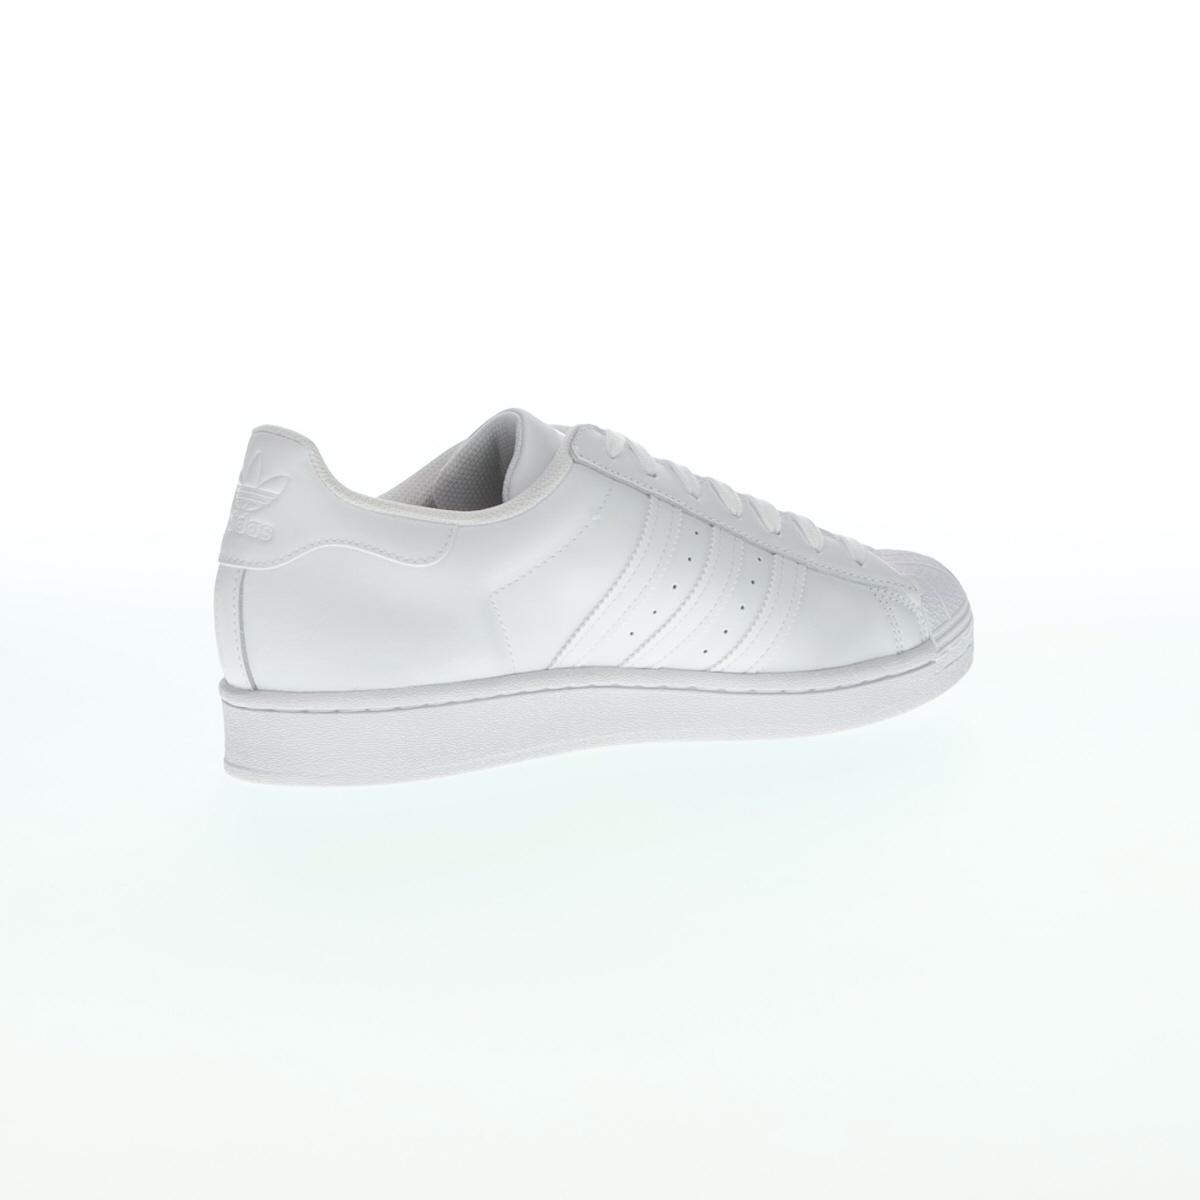 adidas grand slam spezial shoes price list